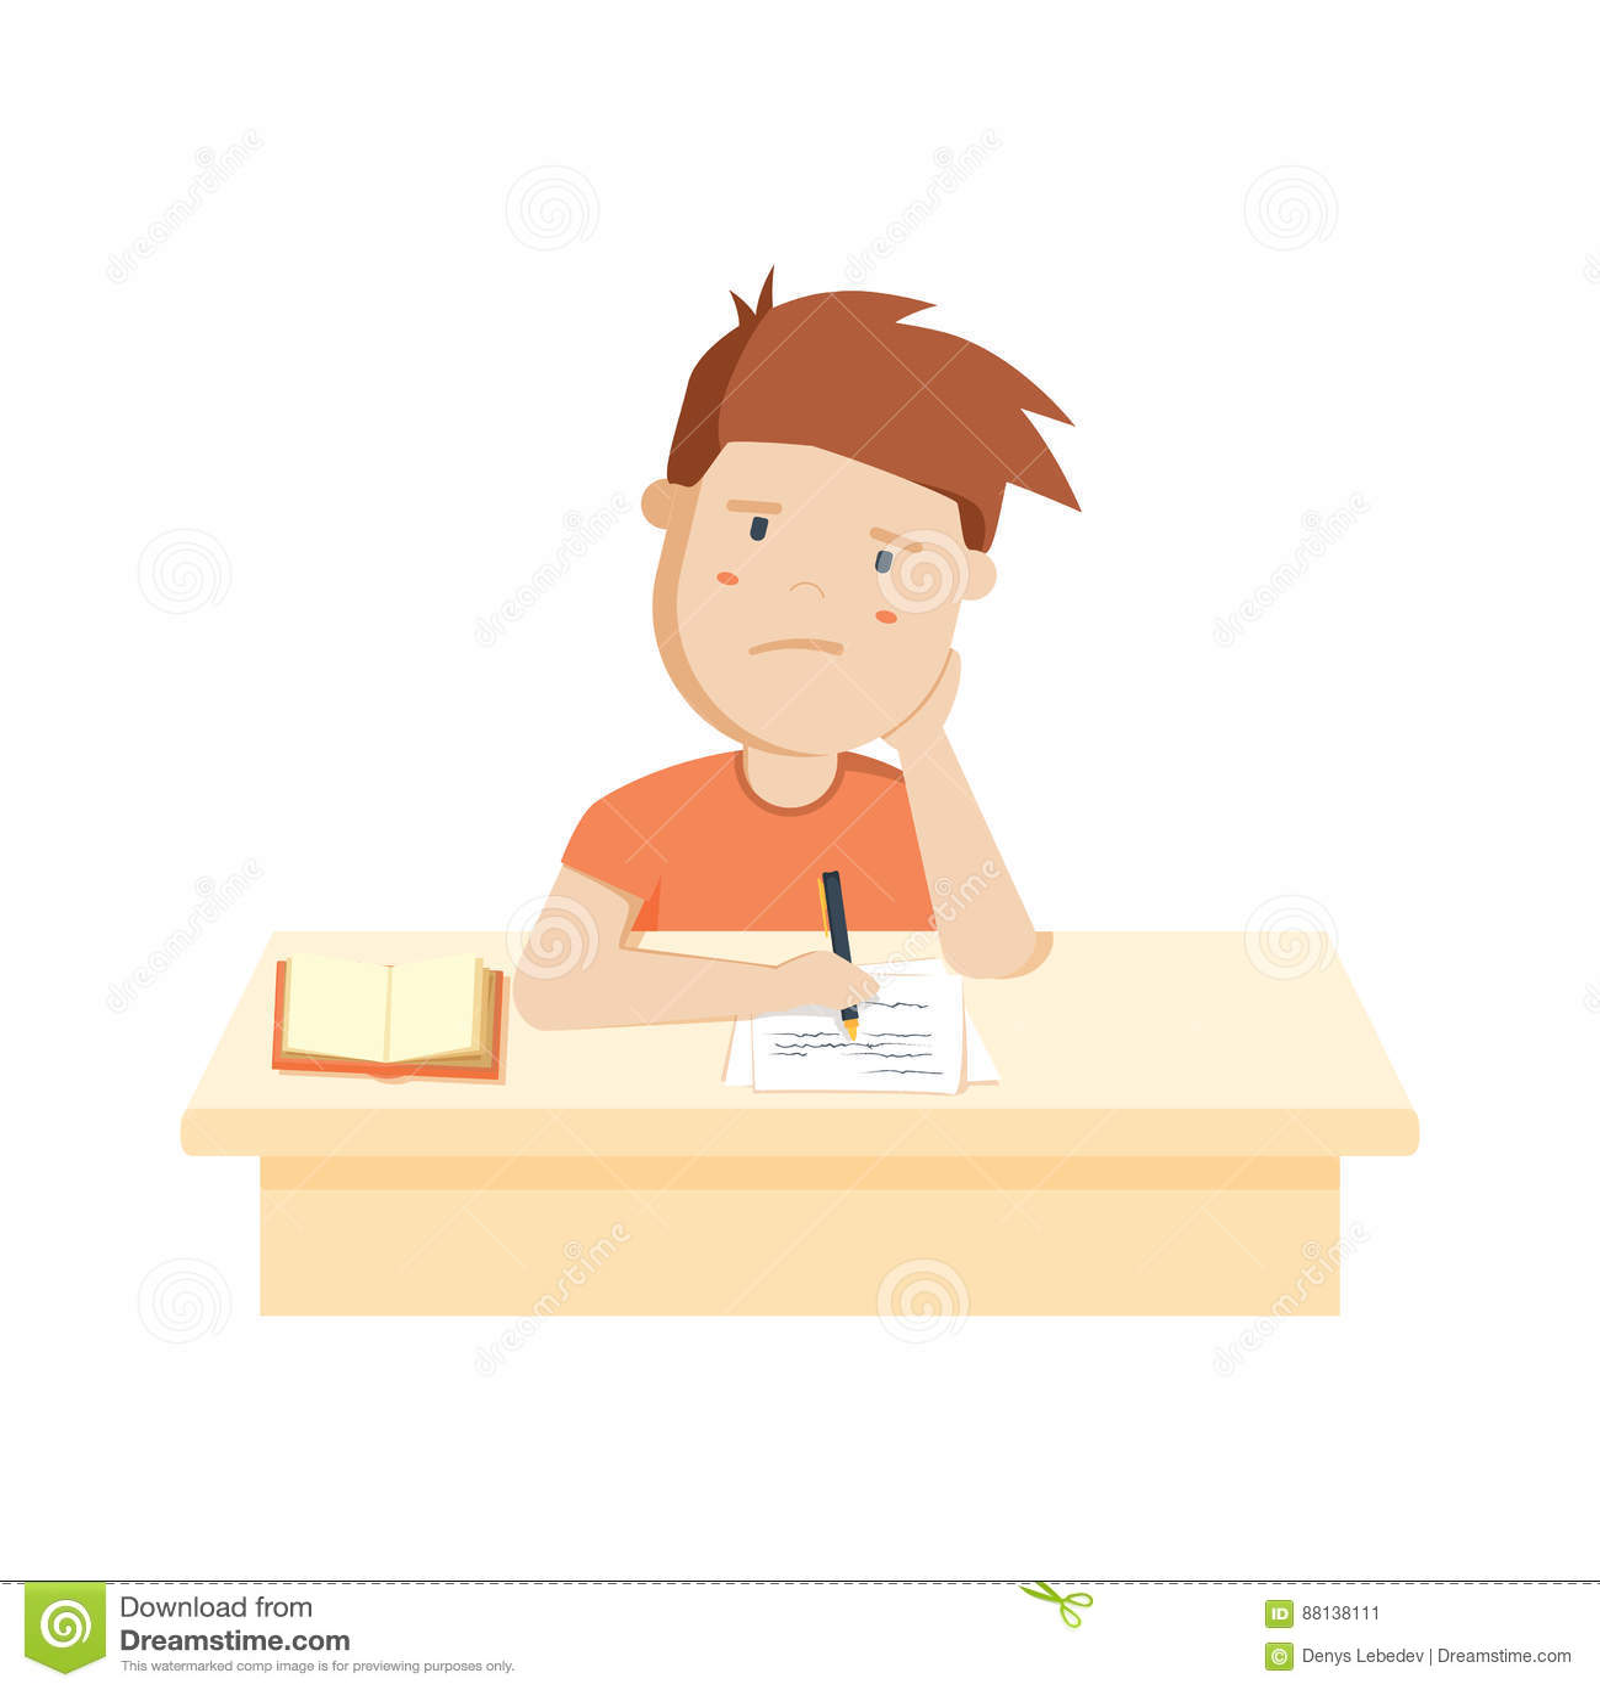 https://thumbs.dreamstime.com/z/bored-kid-doing-homework-sitting-boring-school-lesson-cute-cartoon-vector-illustration-88138111.jpg